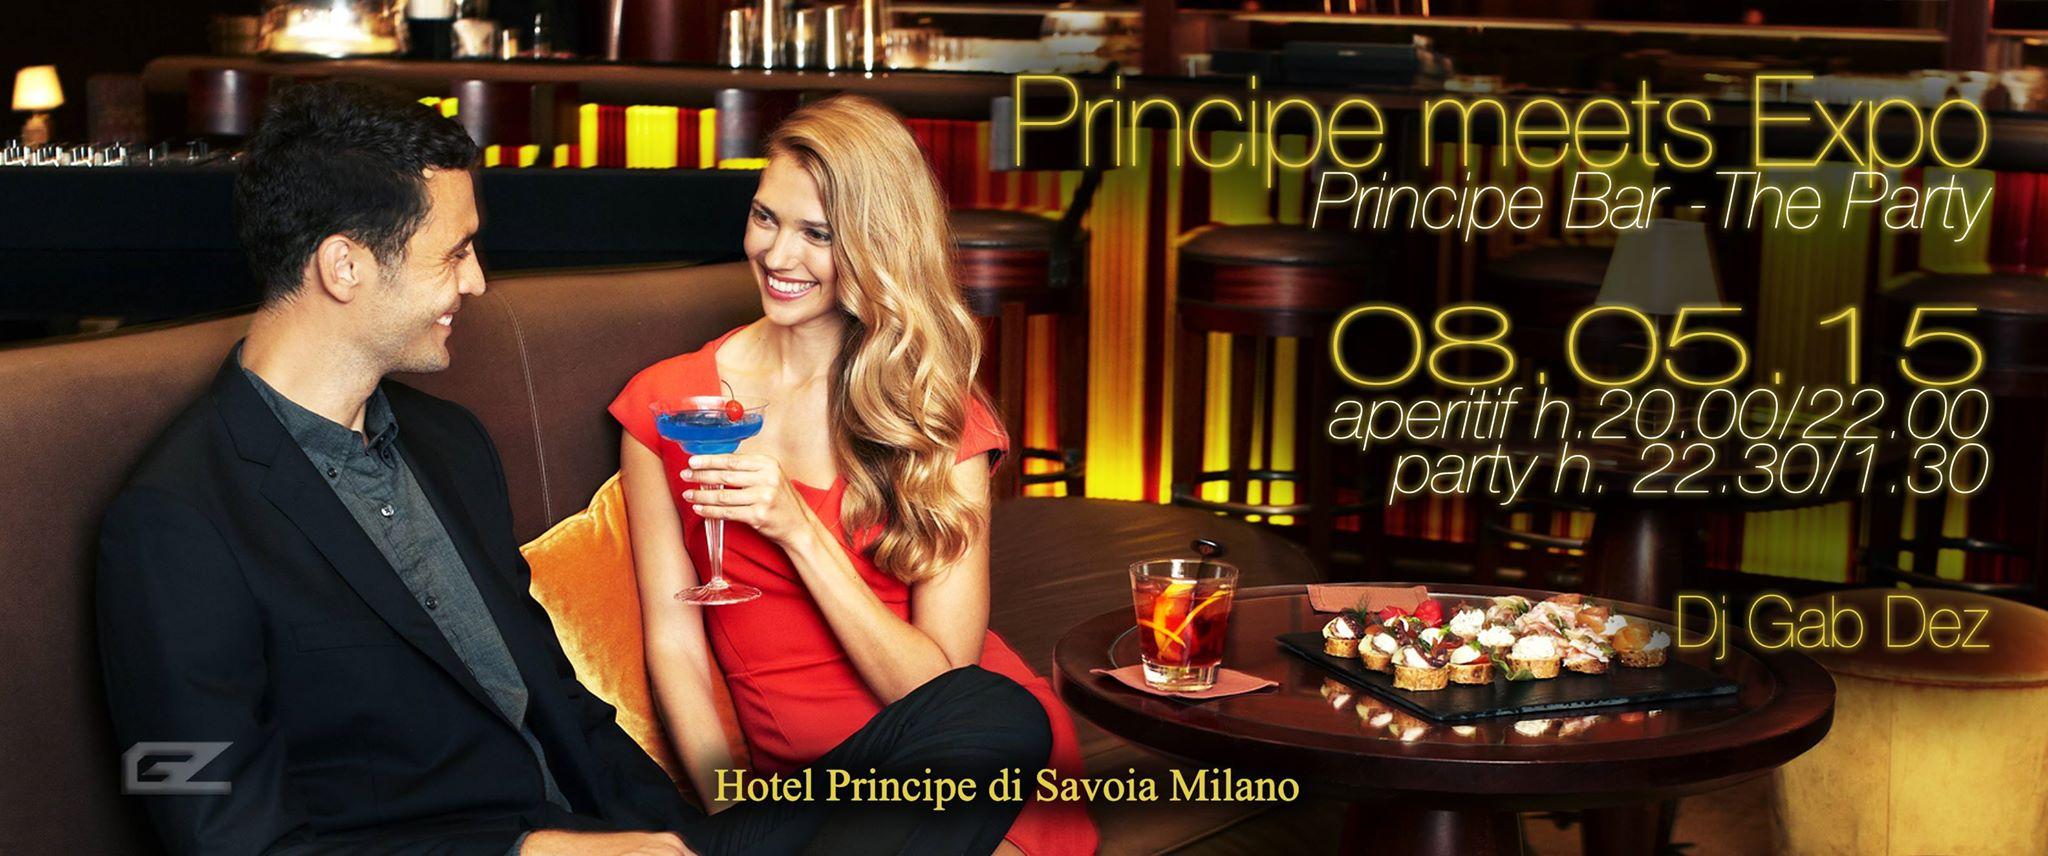 Principe Meets Expo.08.05.15